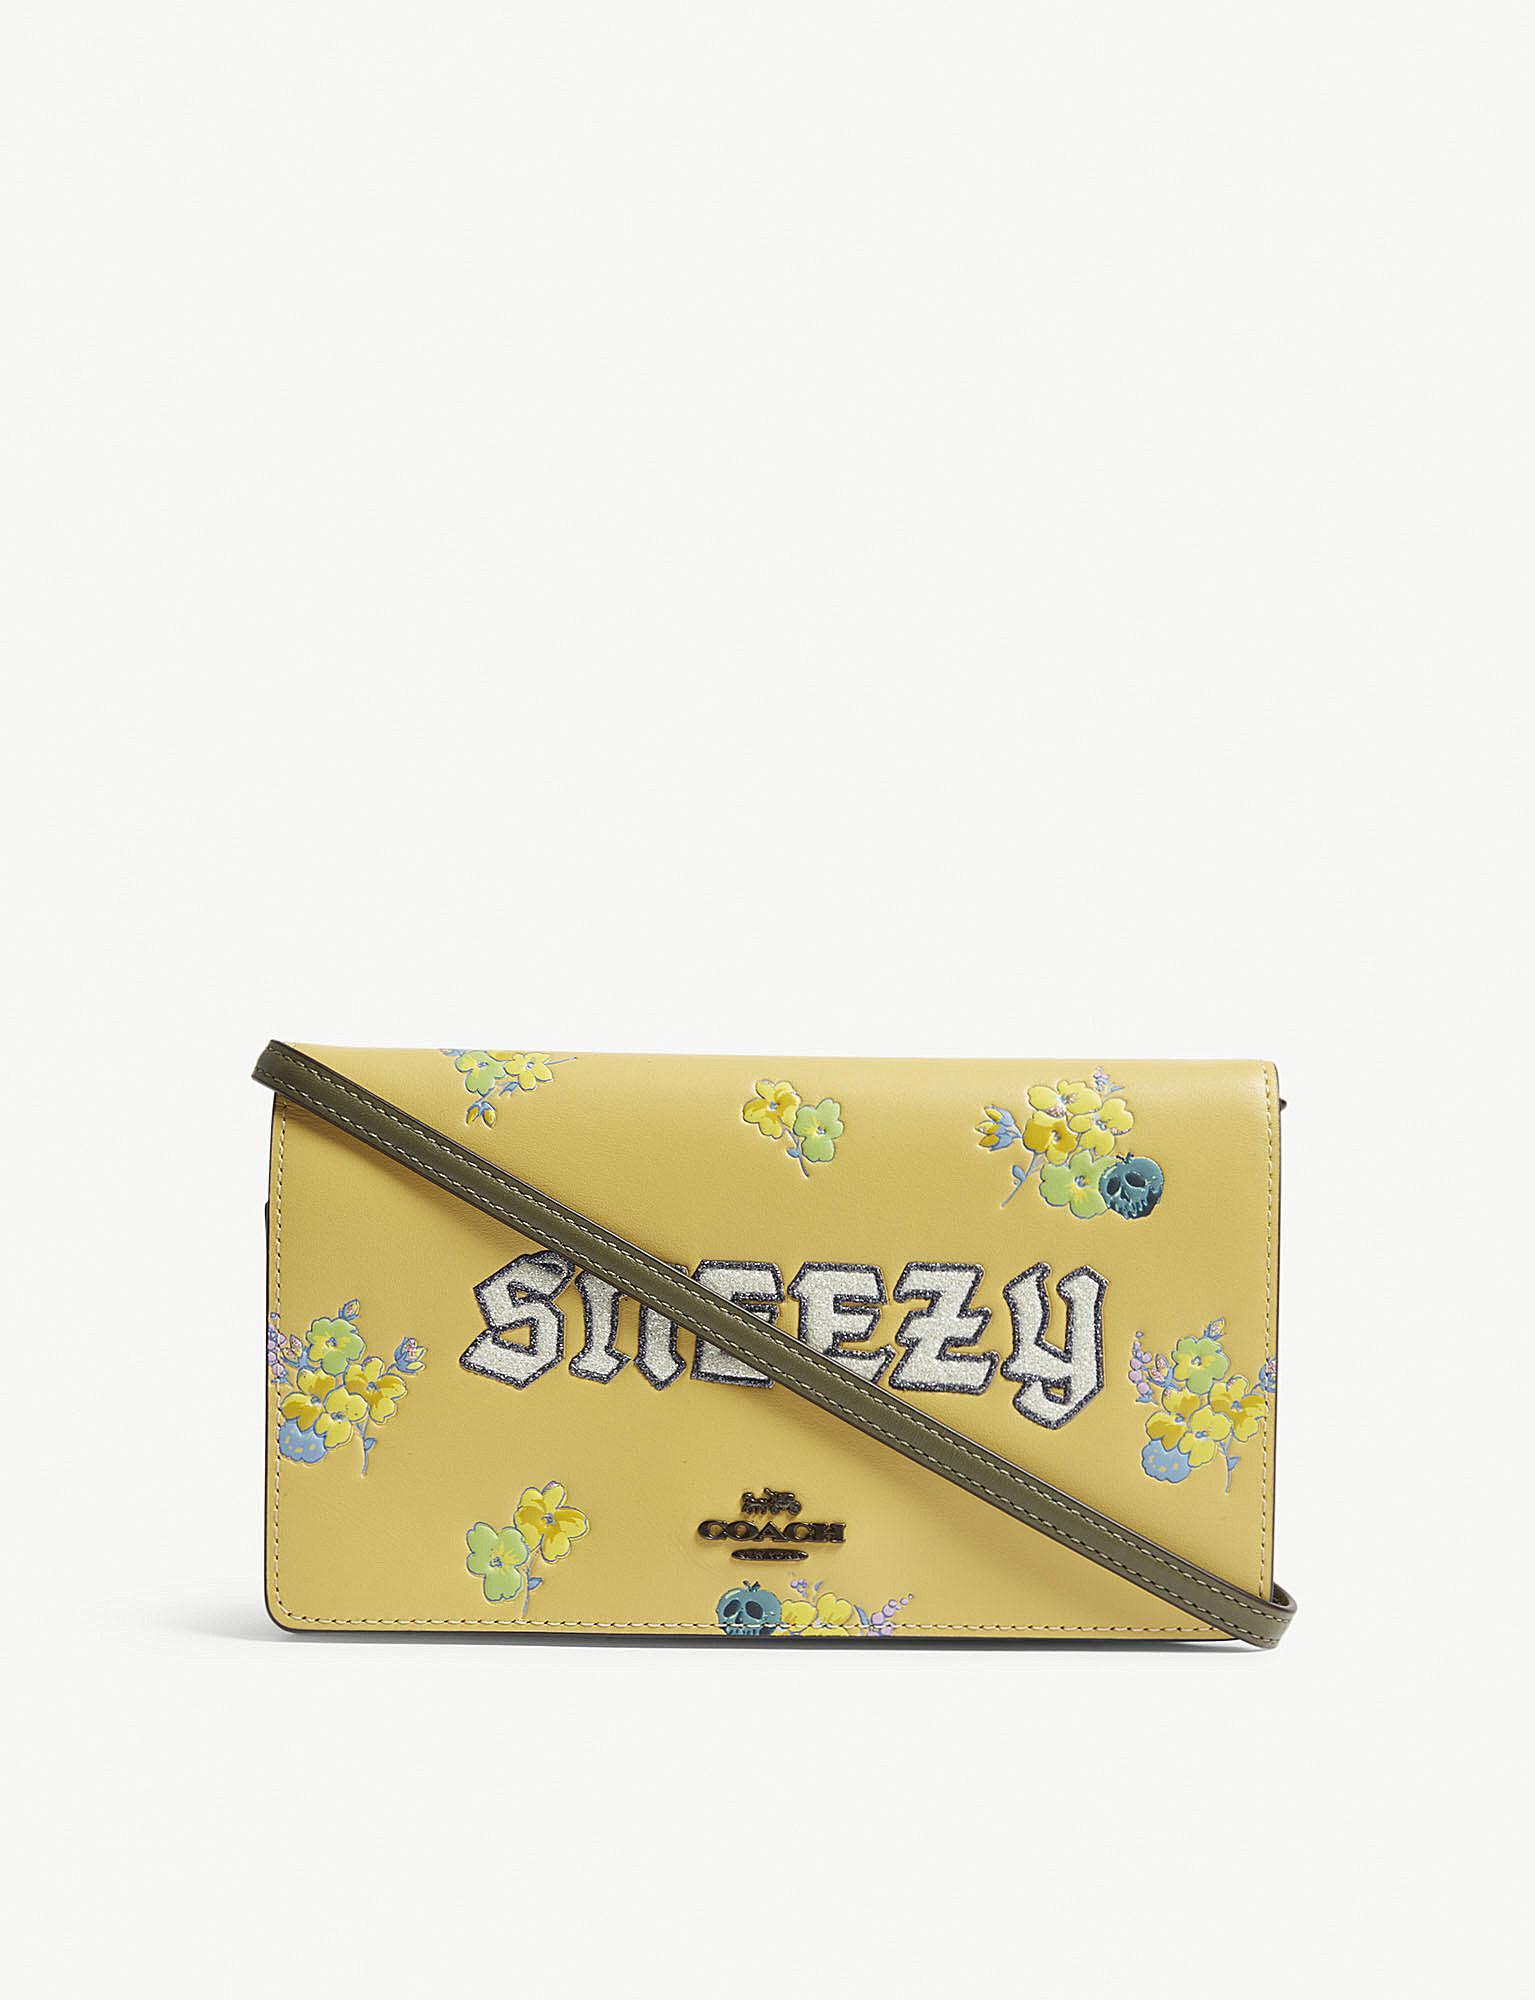 7f00402eed28 COACH. Women s Ladies Yellow Floral Dark Disney Sneezy Leather Cross-body  Bag